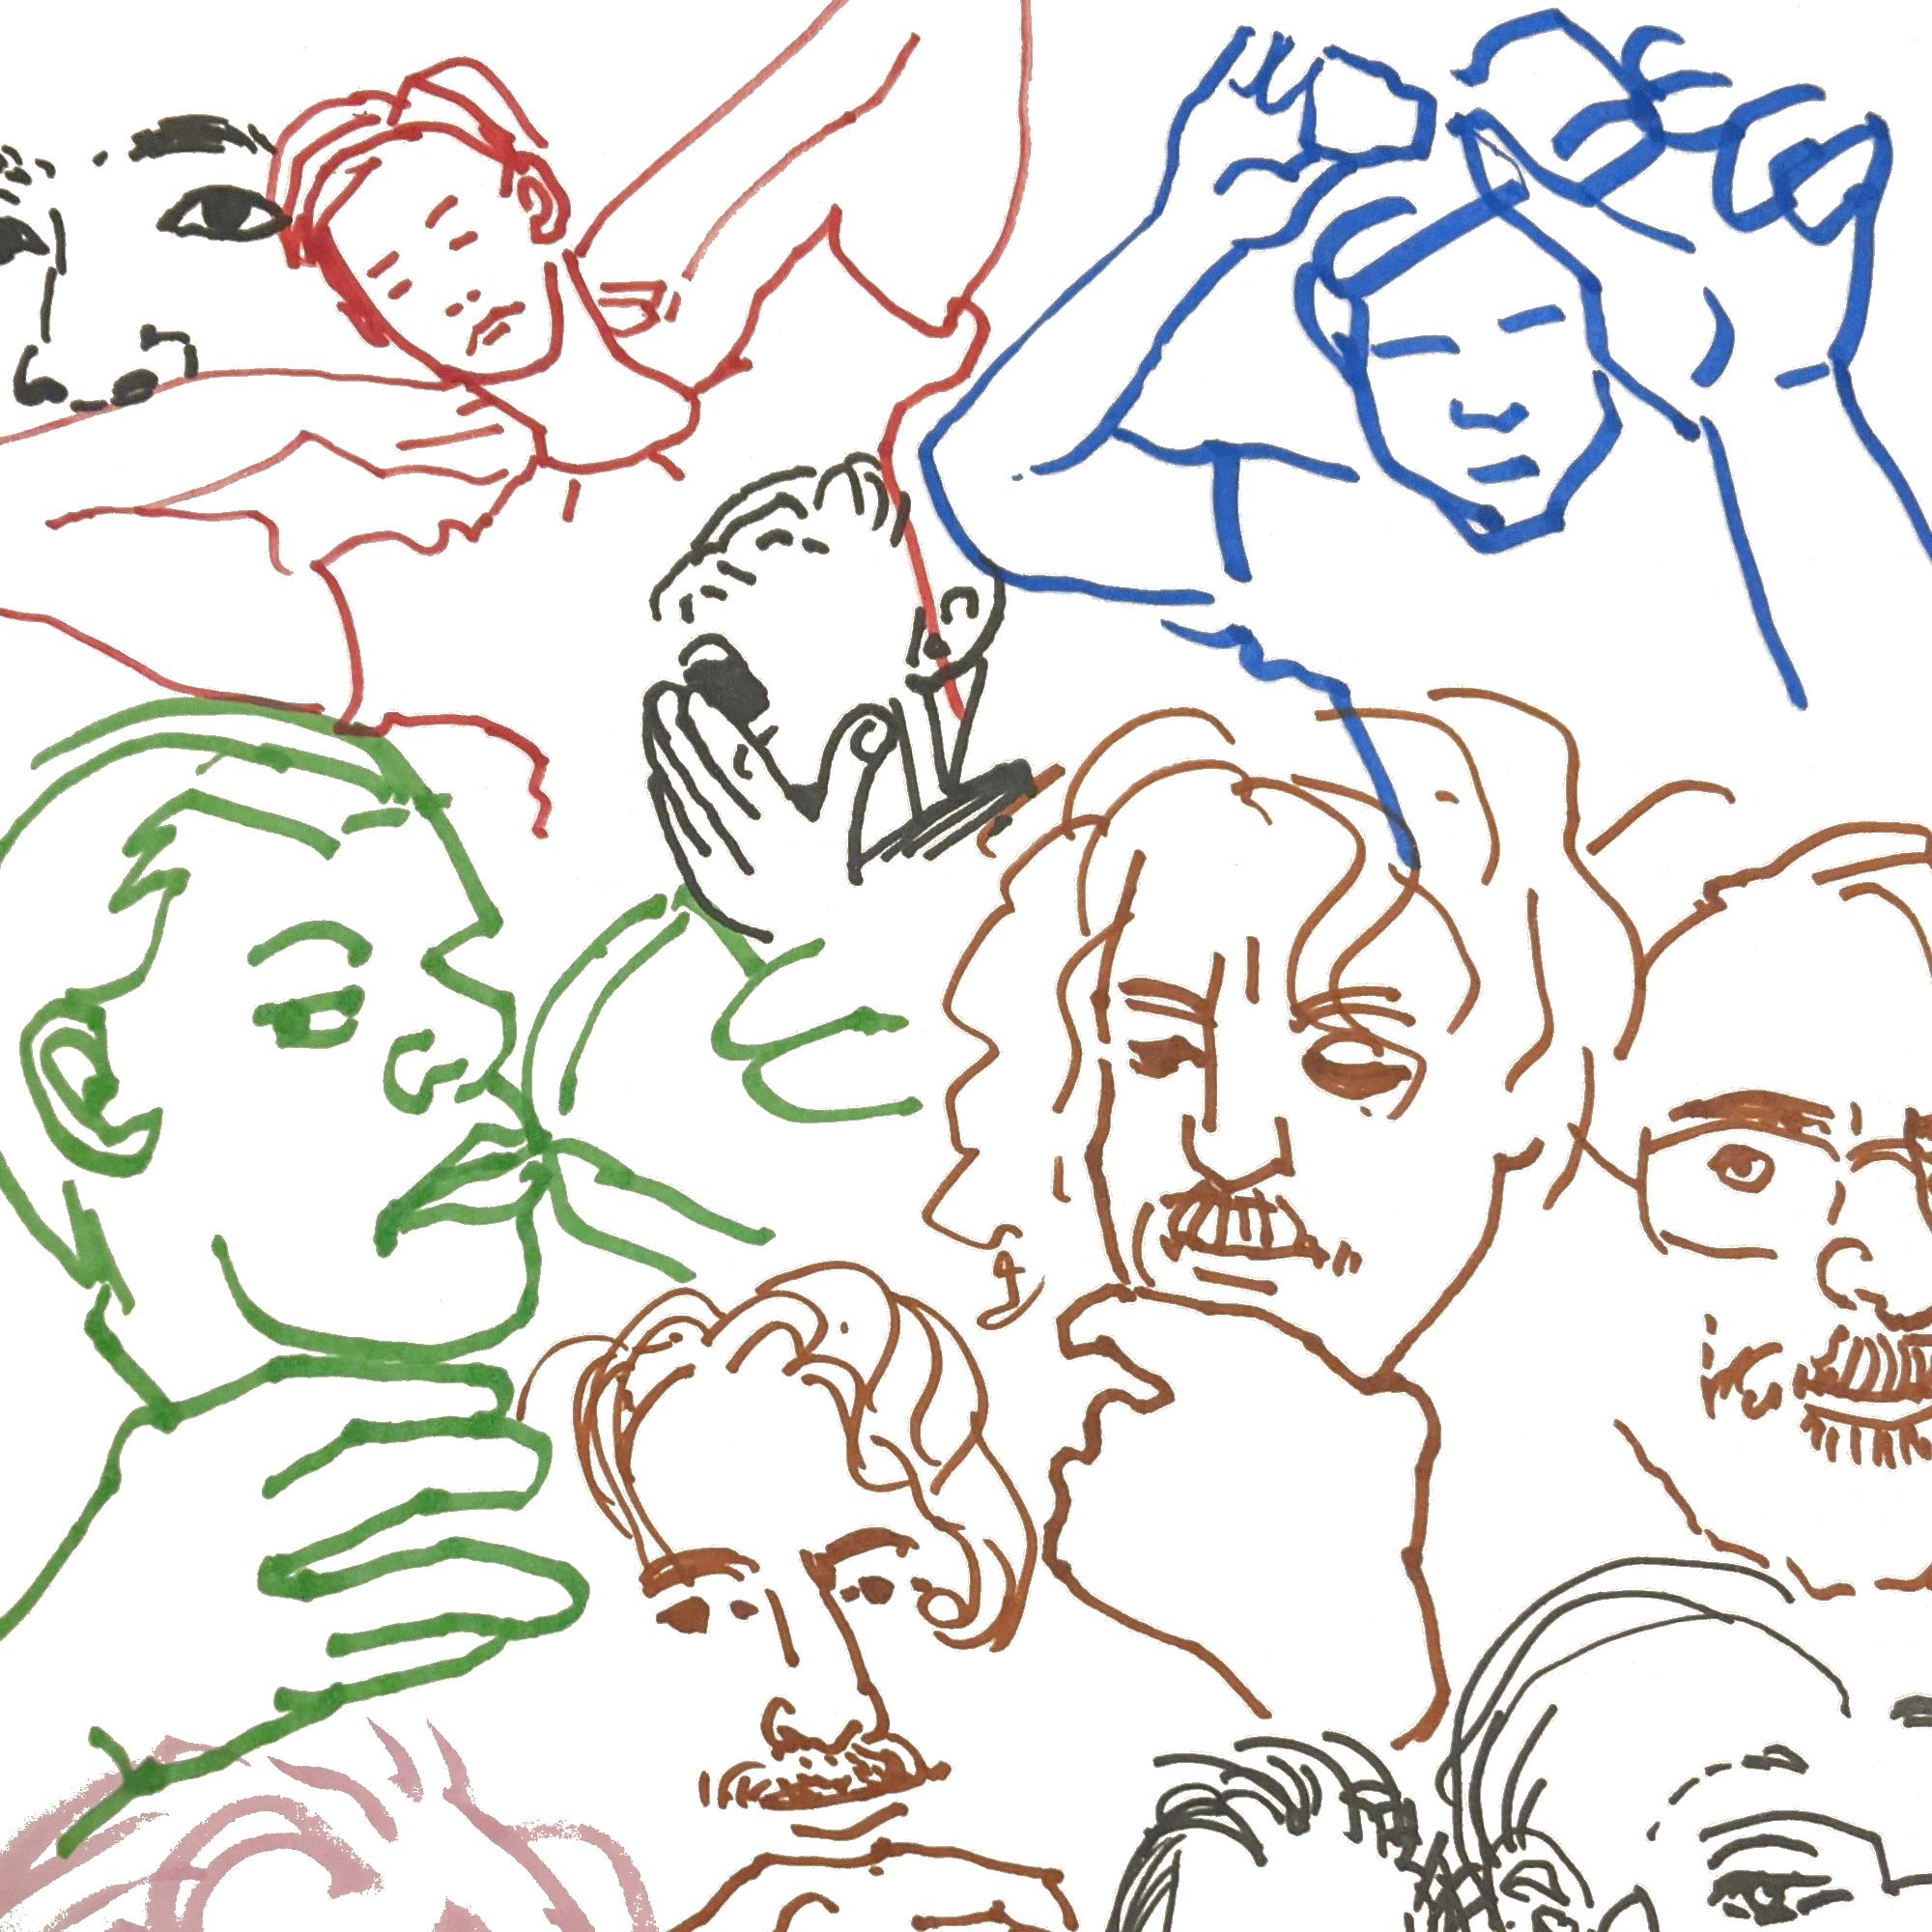 One Minute Portraits - Anthony Yawns